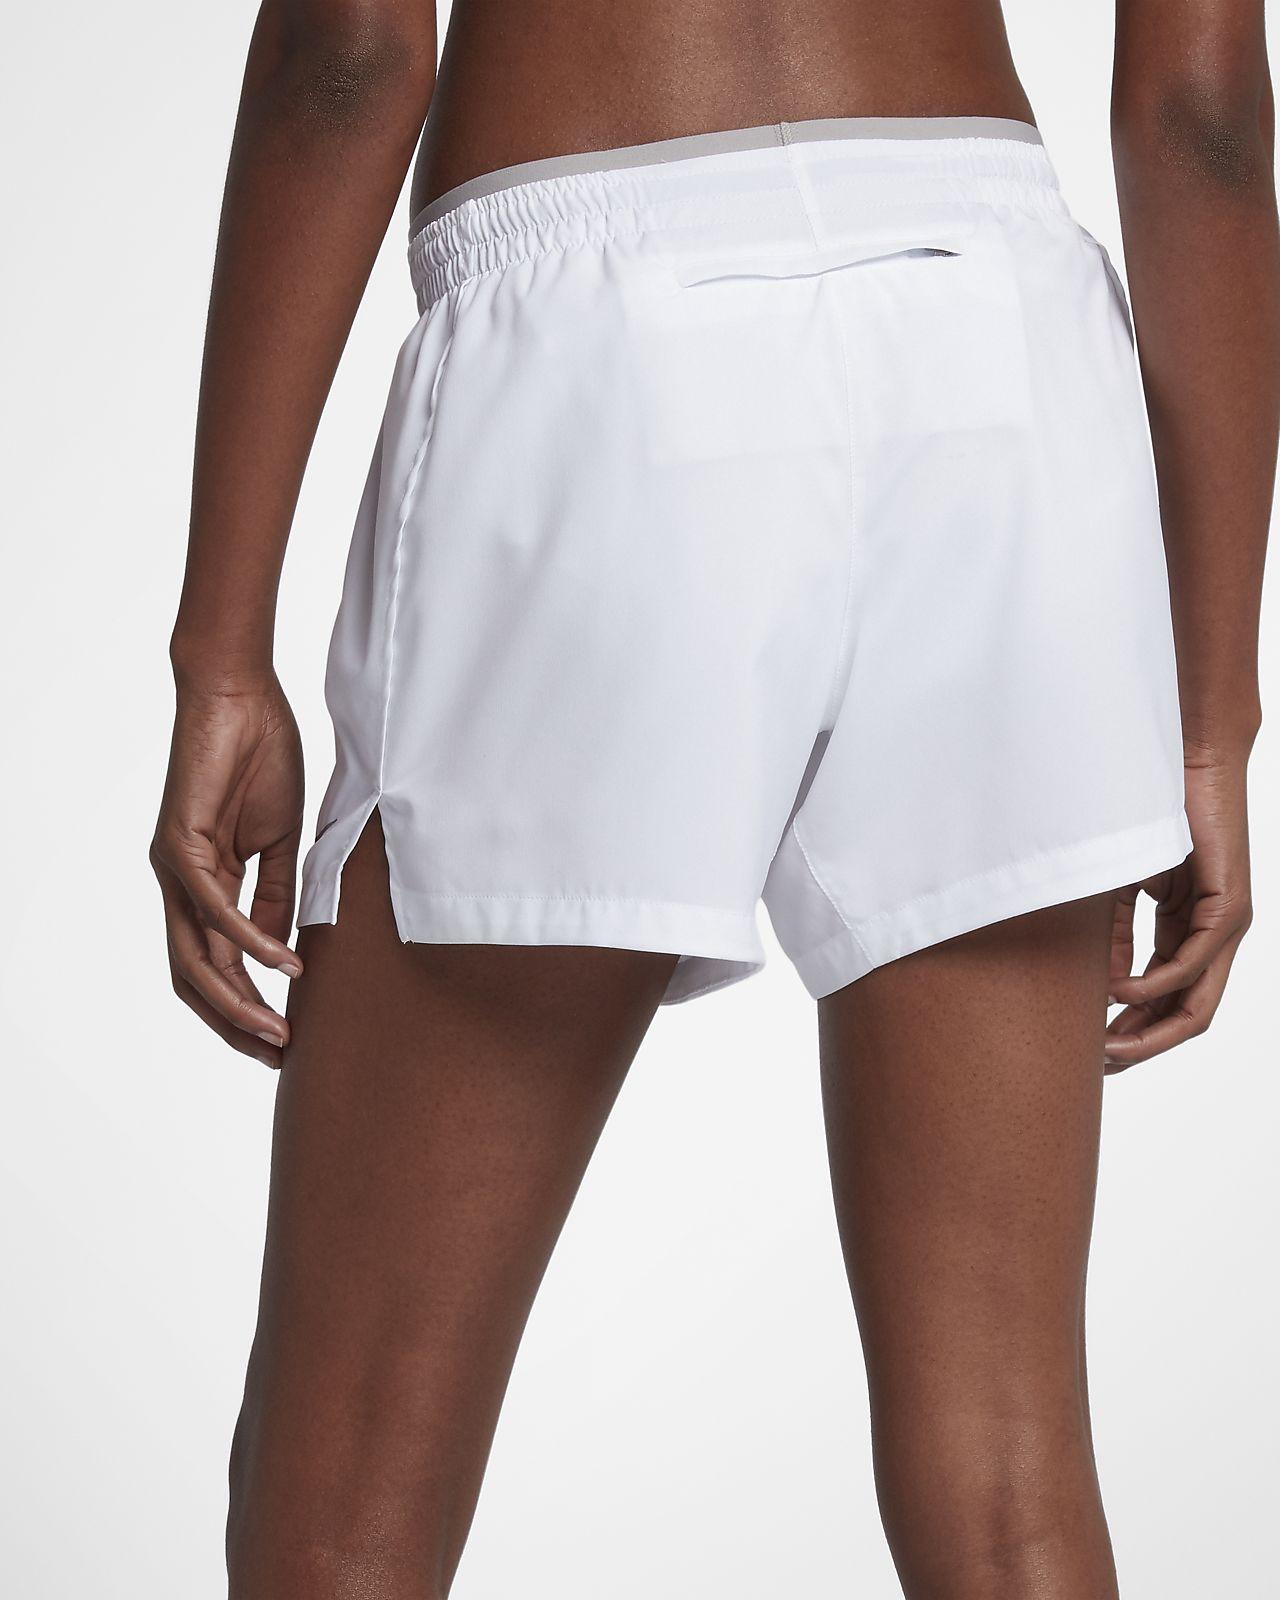 457a9757fc70 Nike Elevate Women s 5